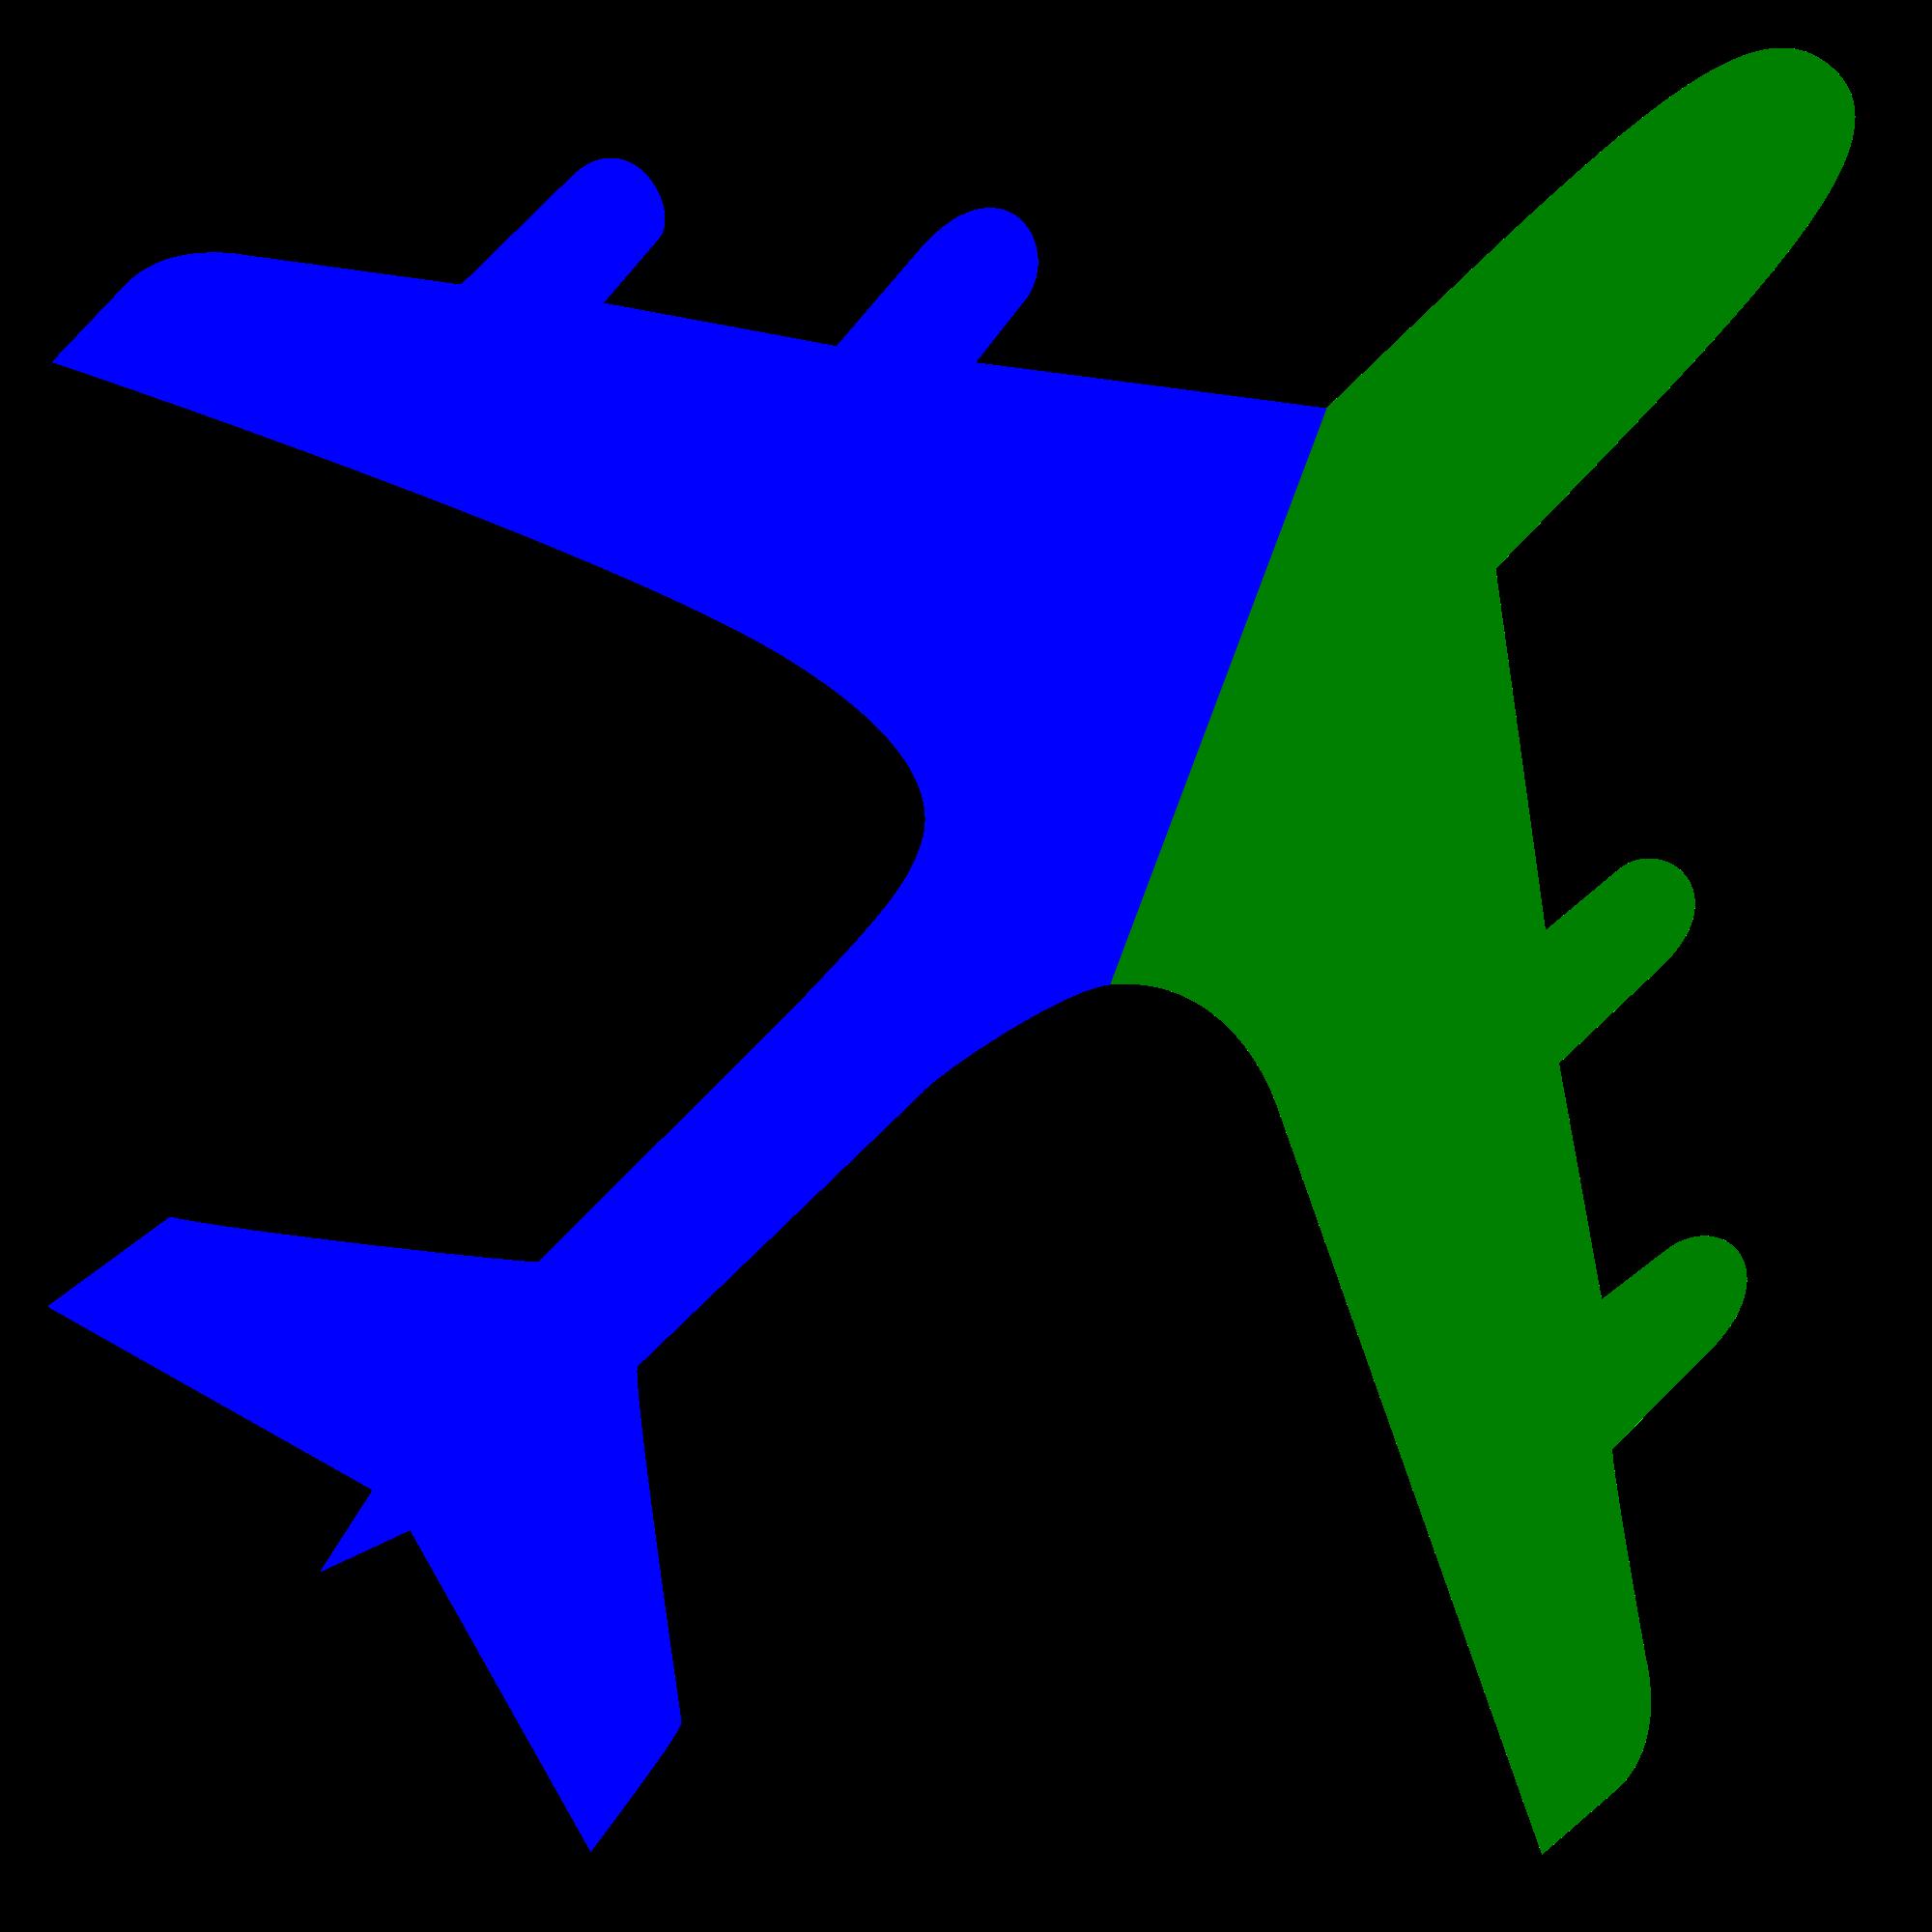 2000x2000 Fileairplane Silhouette Blue Green.svg